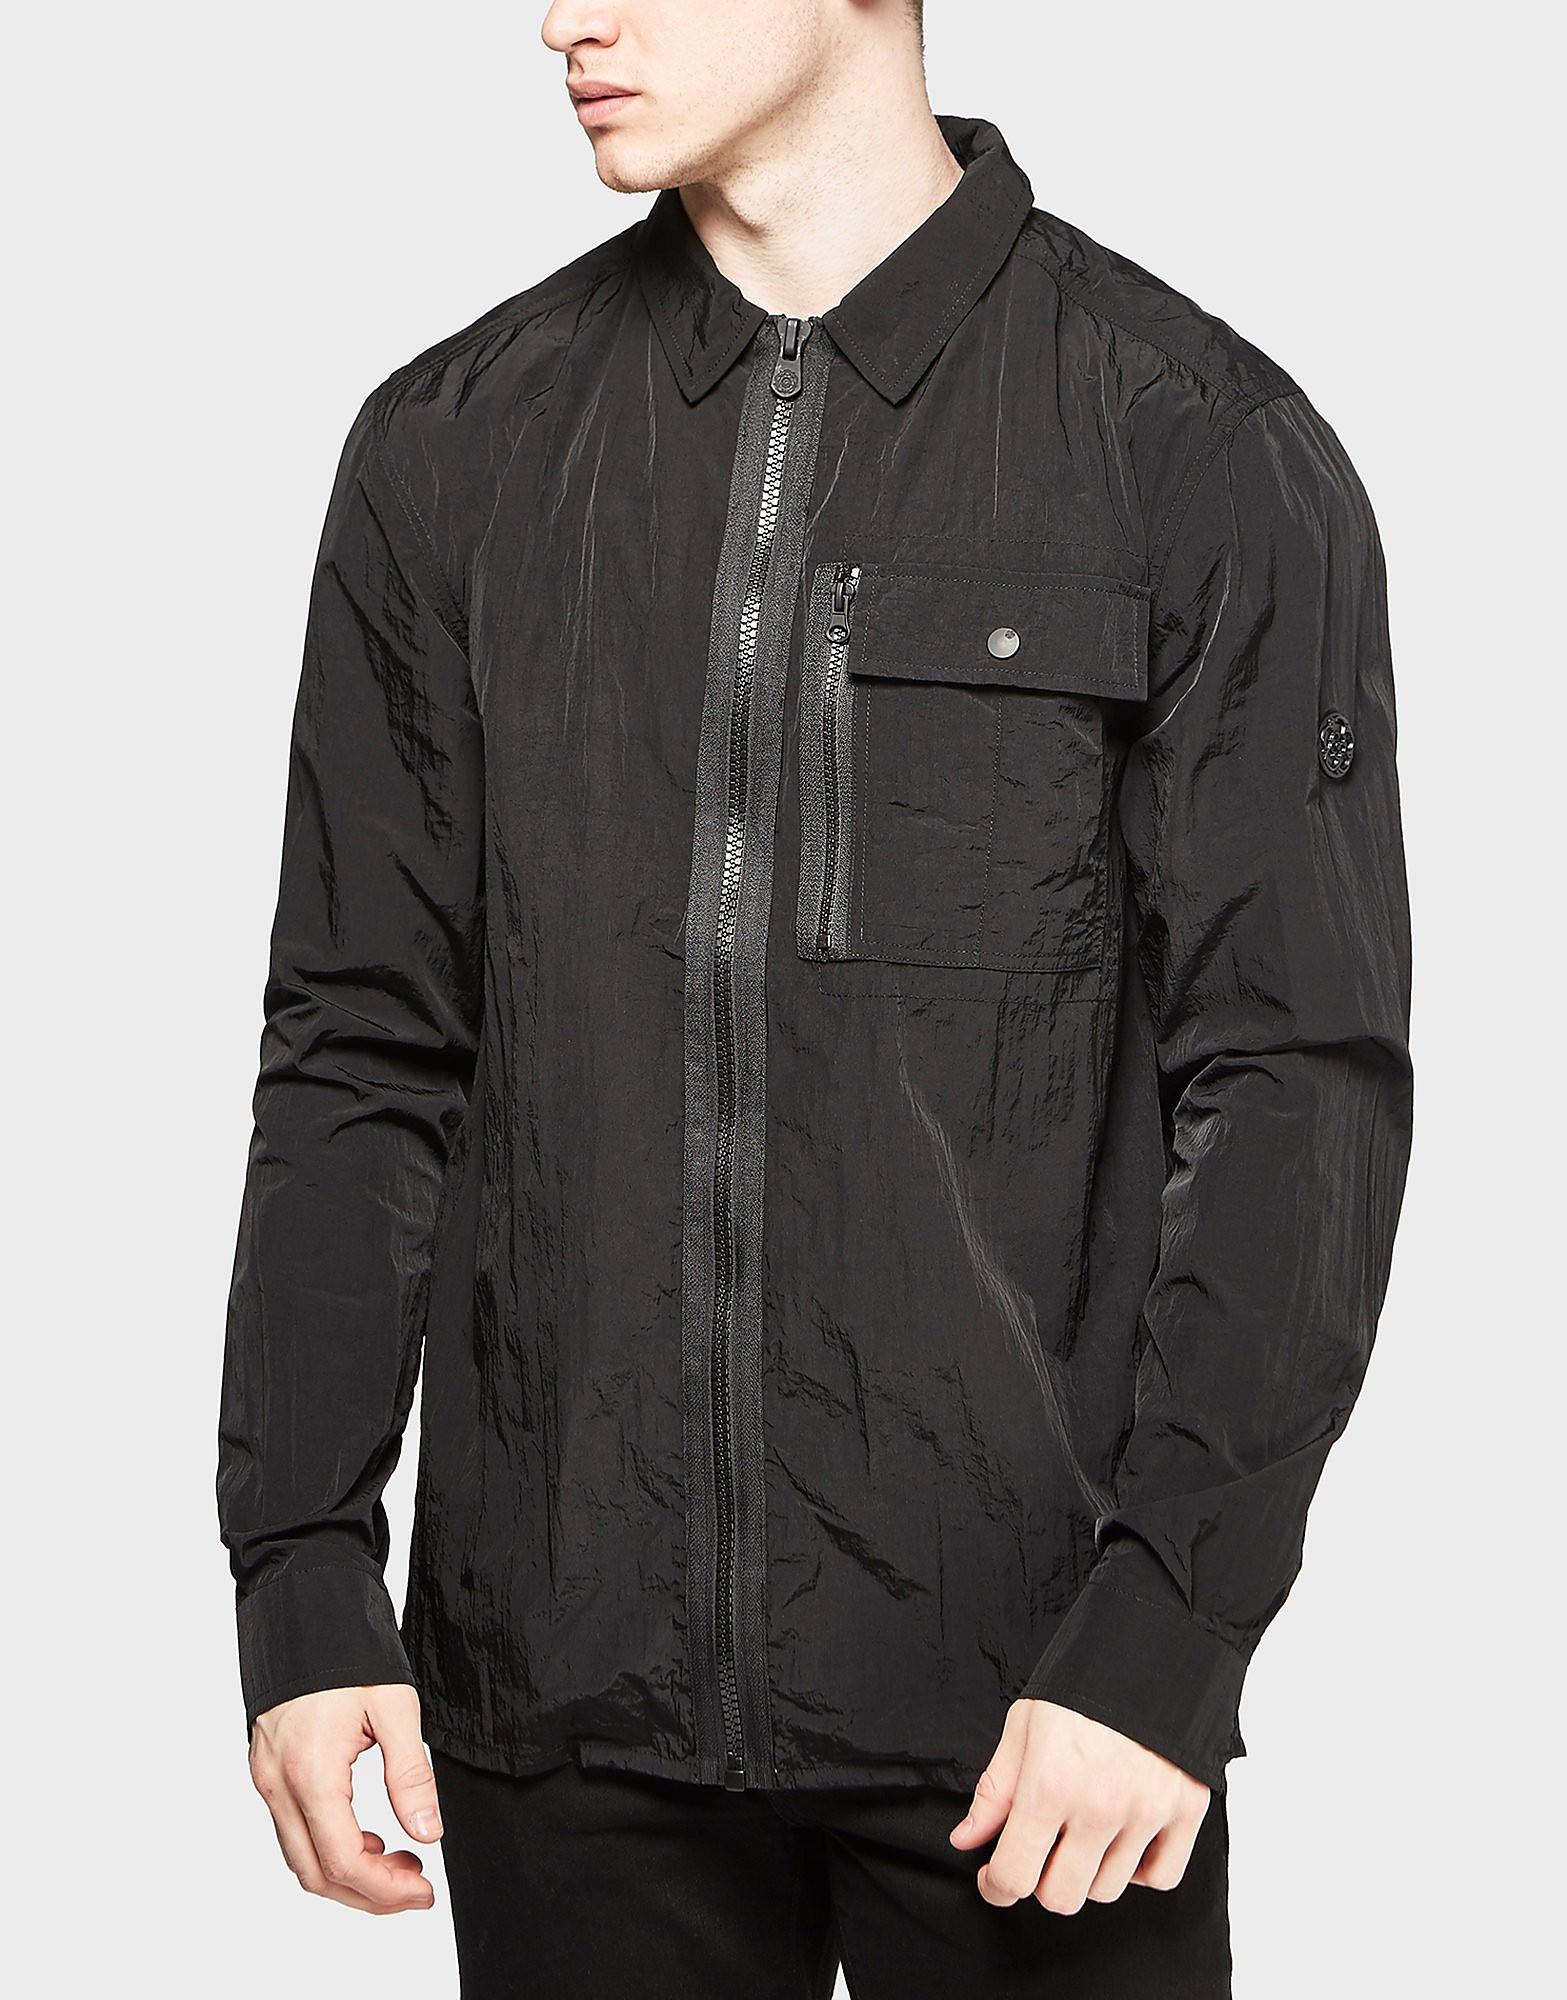 Nicholas Deakins Firm Shirt - Exclusive